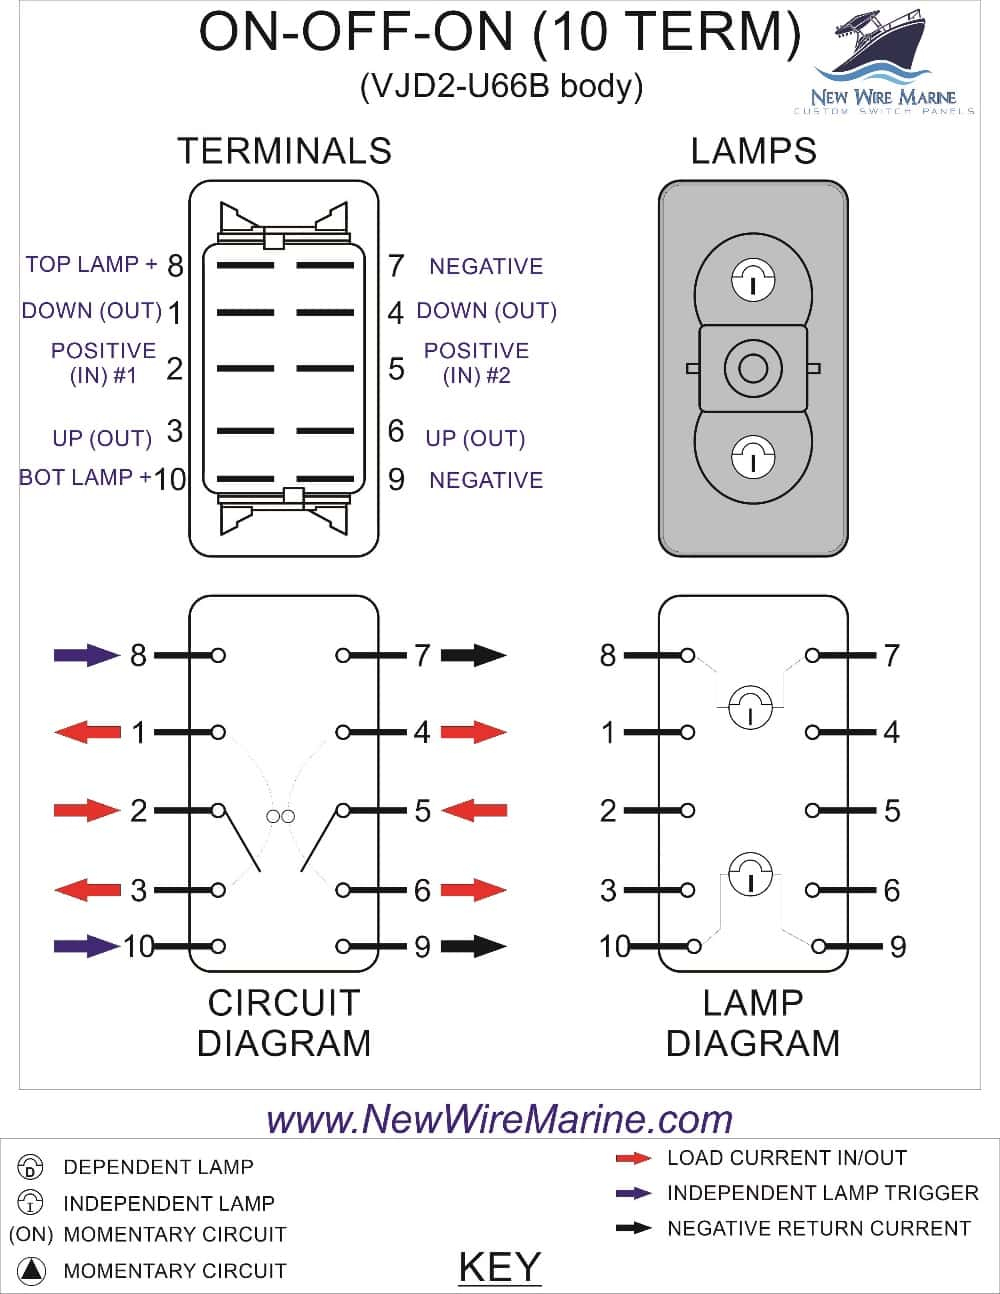 On-Off-On Backlit Rocker Switch | Blue Led | New Wire Marine - Carling Rocker Switch Wiring Diagram